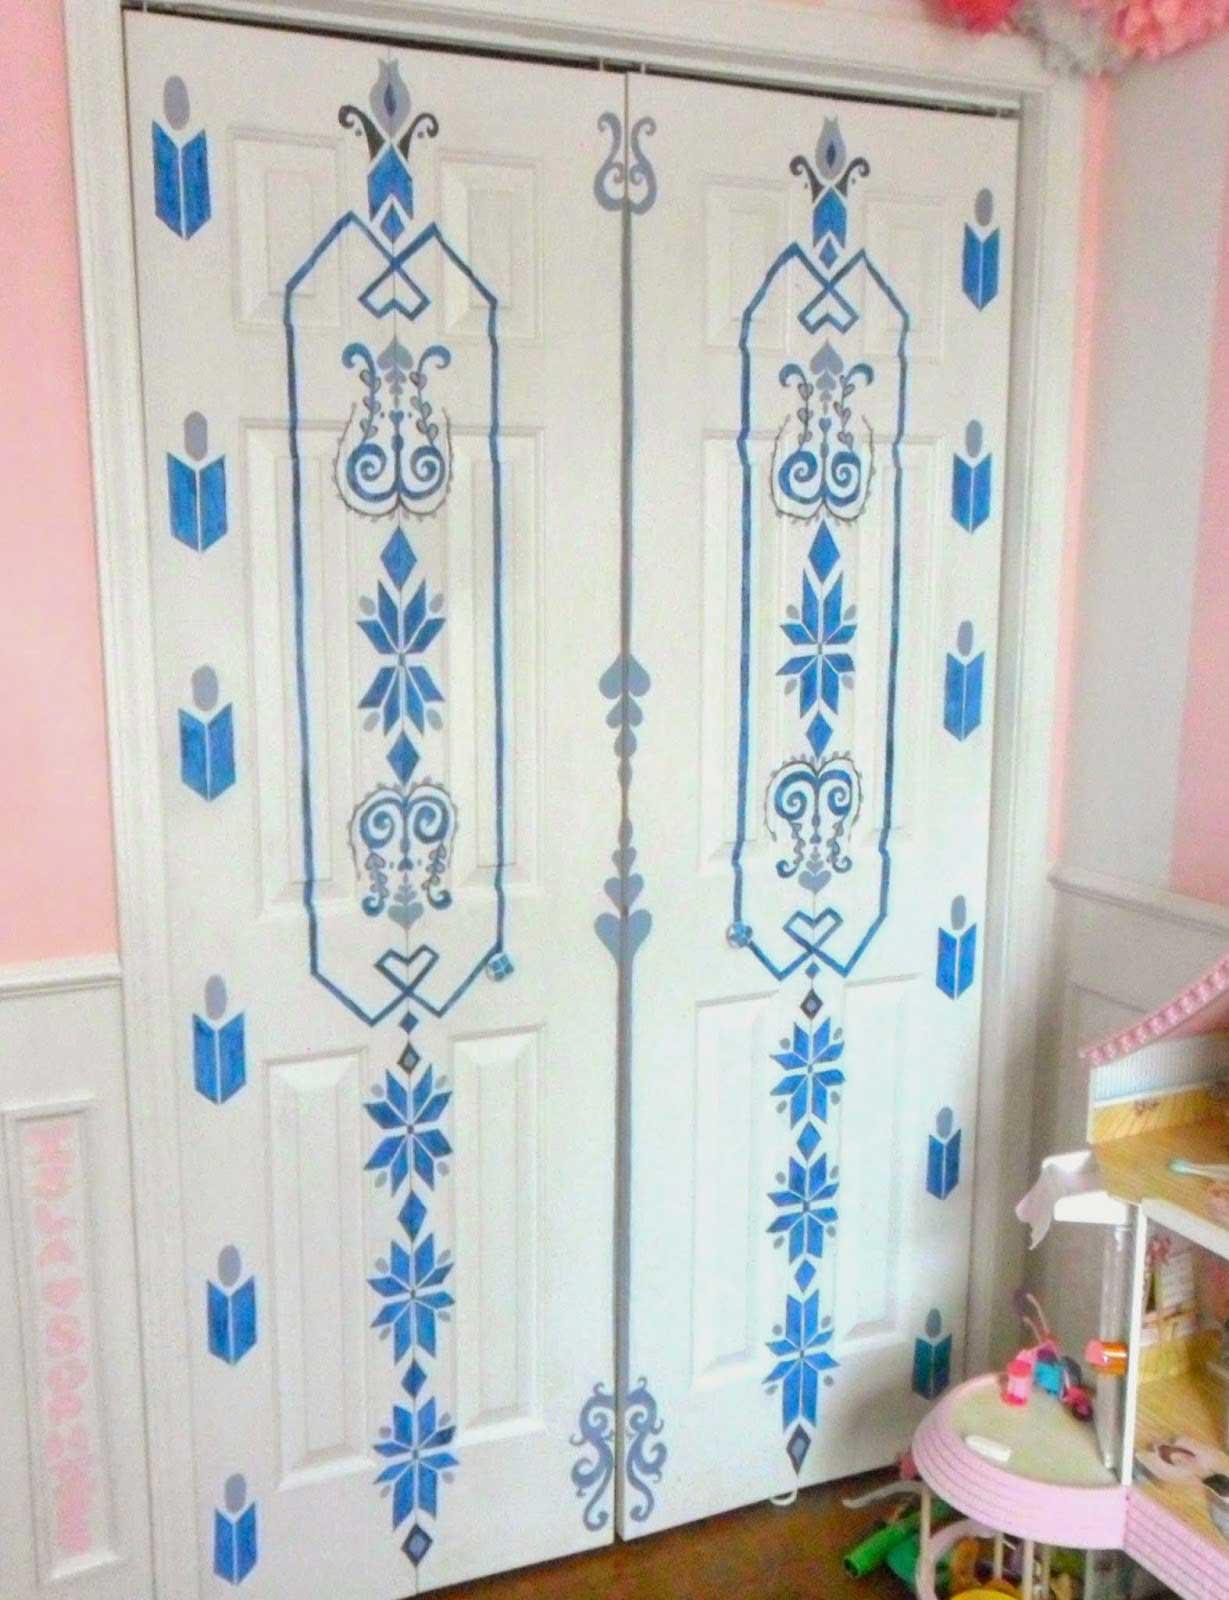 Frozen Themed Room Decor Ideas - YouTube  |Frozen Themed Room